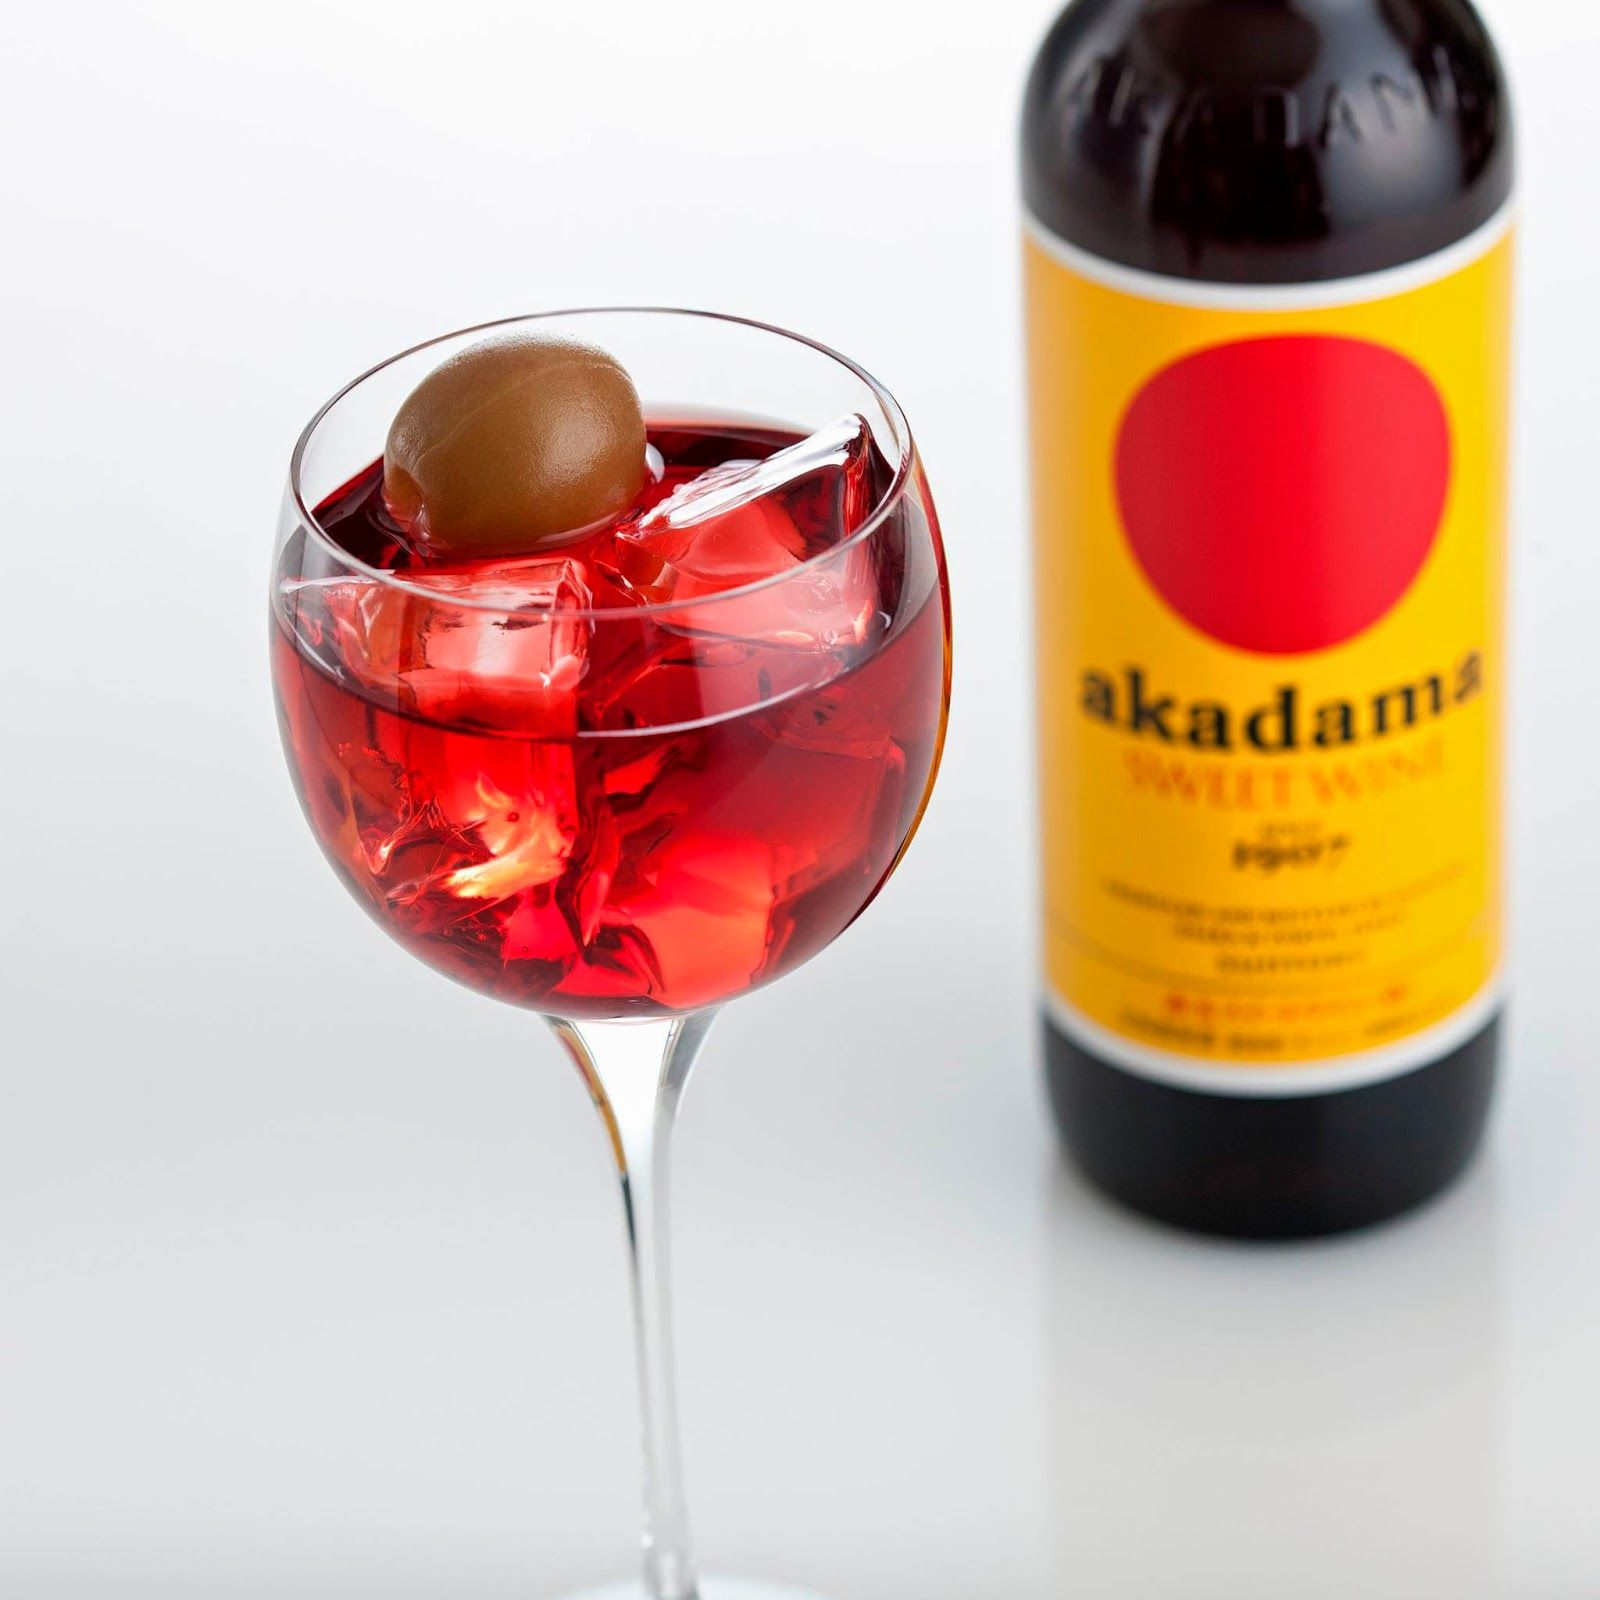 Suntory Akadama Wine Cocktail Wine Cocktails Cocktails Holiday Wine